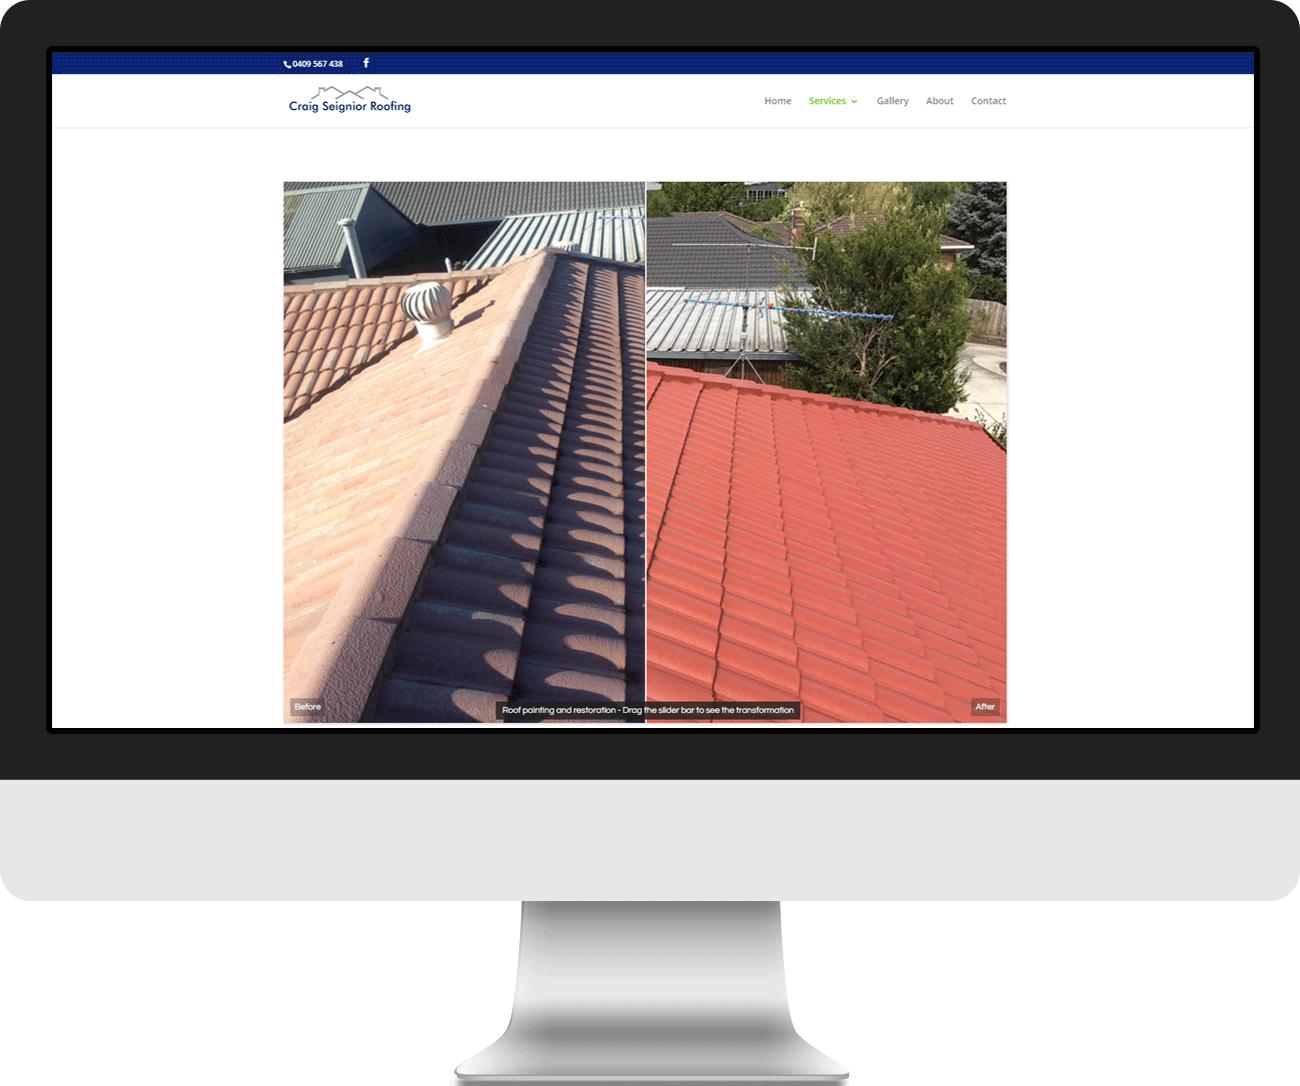 craig-seignior-roofing-gippsland